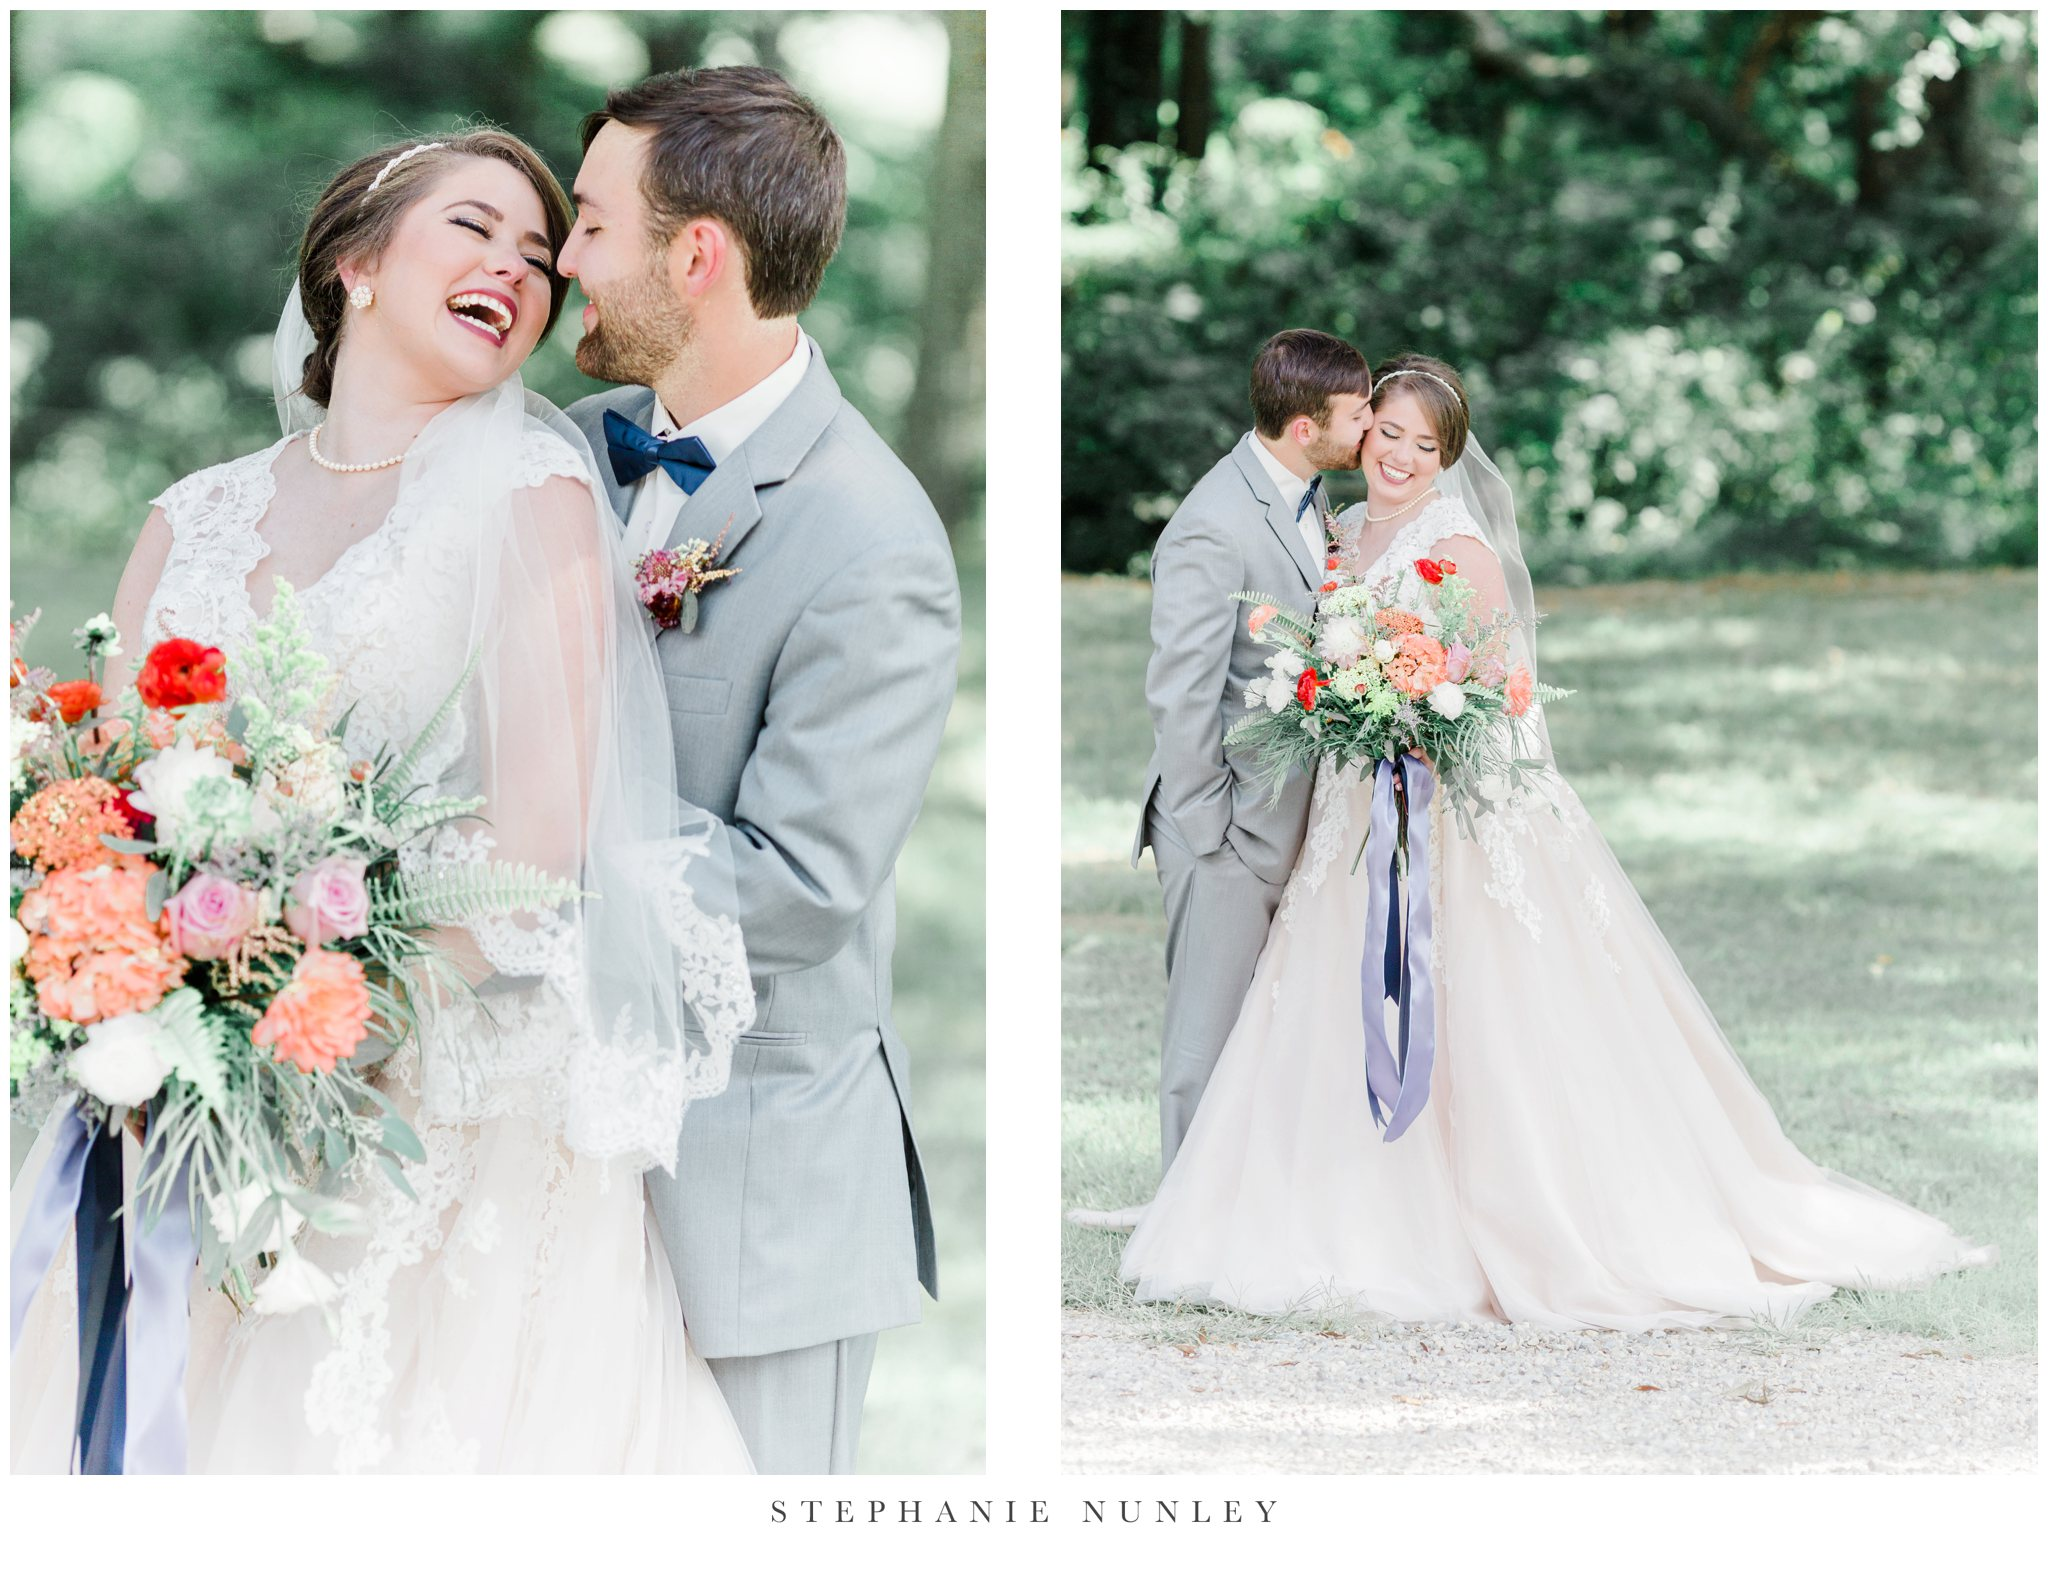 arkansas-wedding-with-lush-wildflower-bouquet-0057.jpg